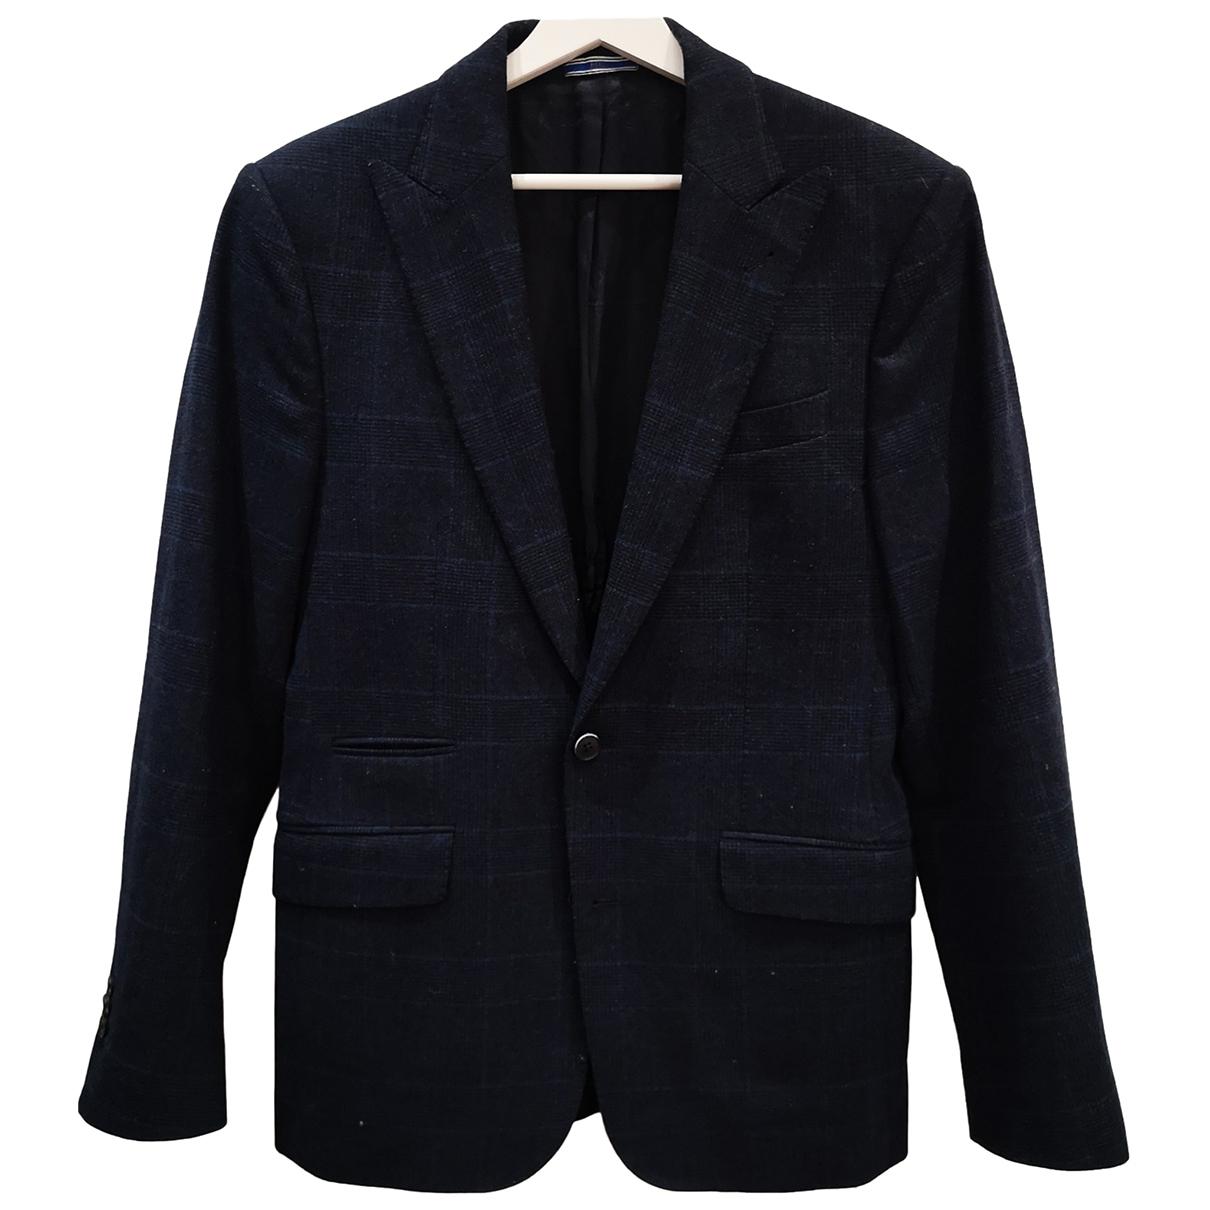 Mango \N Blue Wool jacket  for Men 38 UK - US